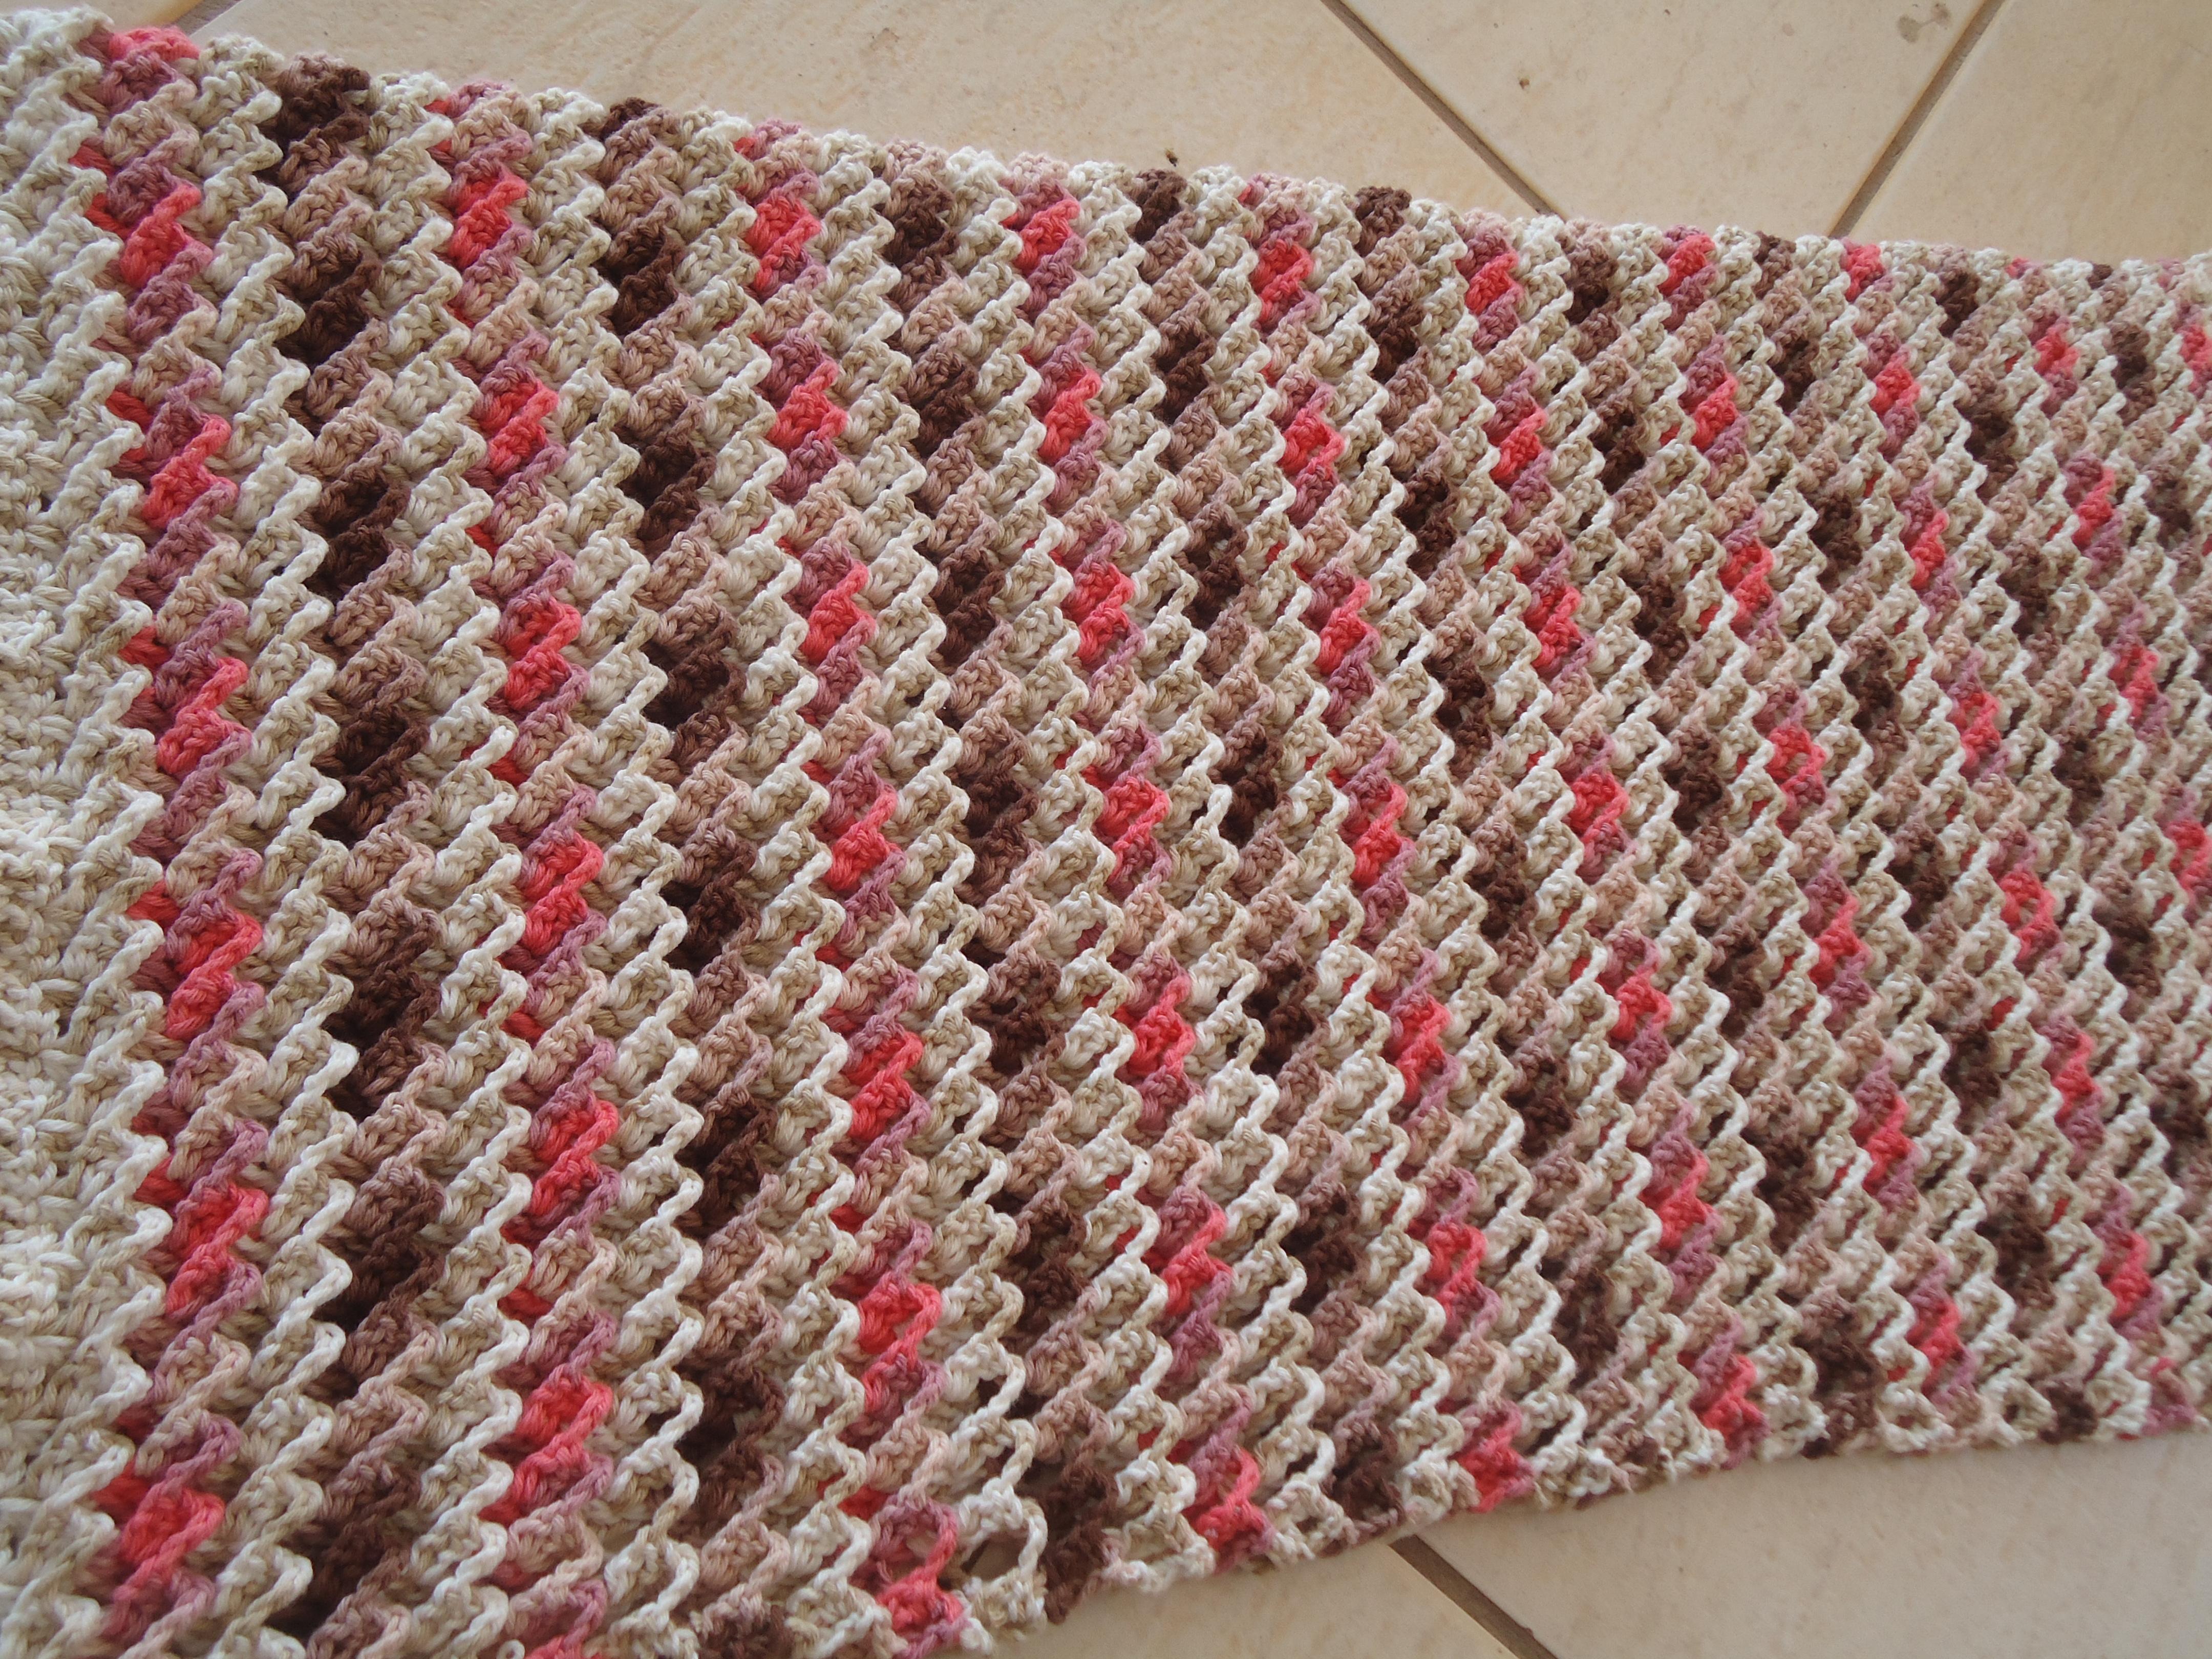 tapete de barbante 3d crochet no ponto elo7. Black Bedroom Furniture Sets. Home Design Ideas